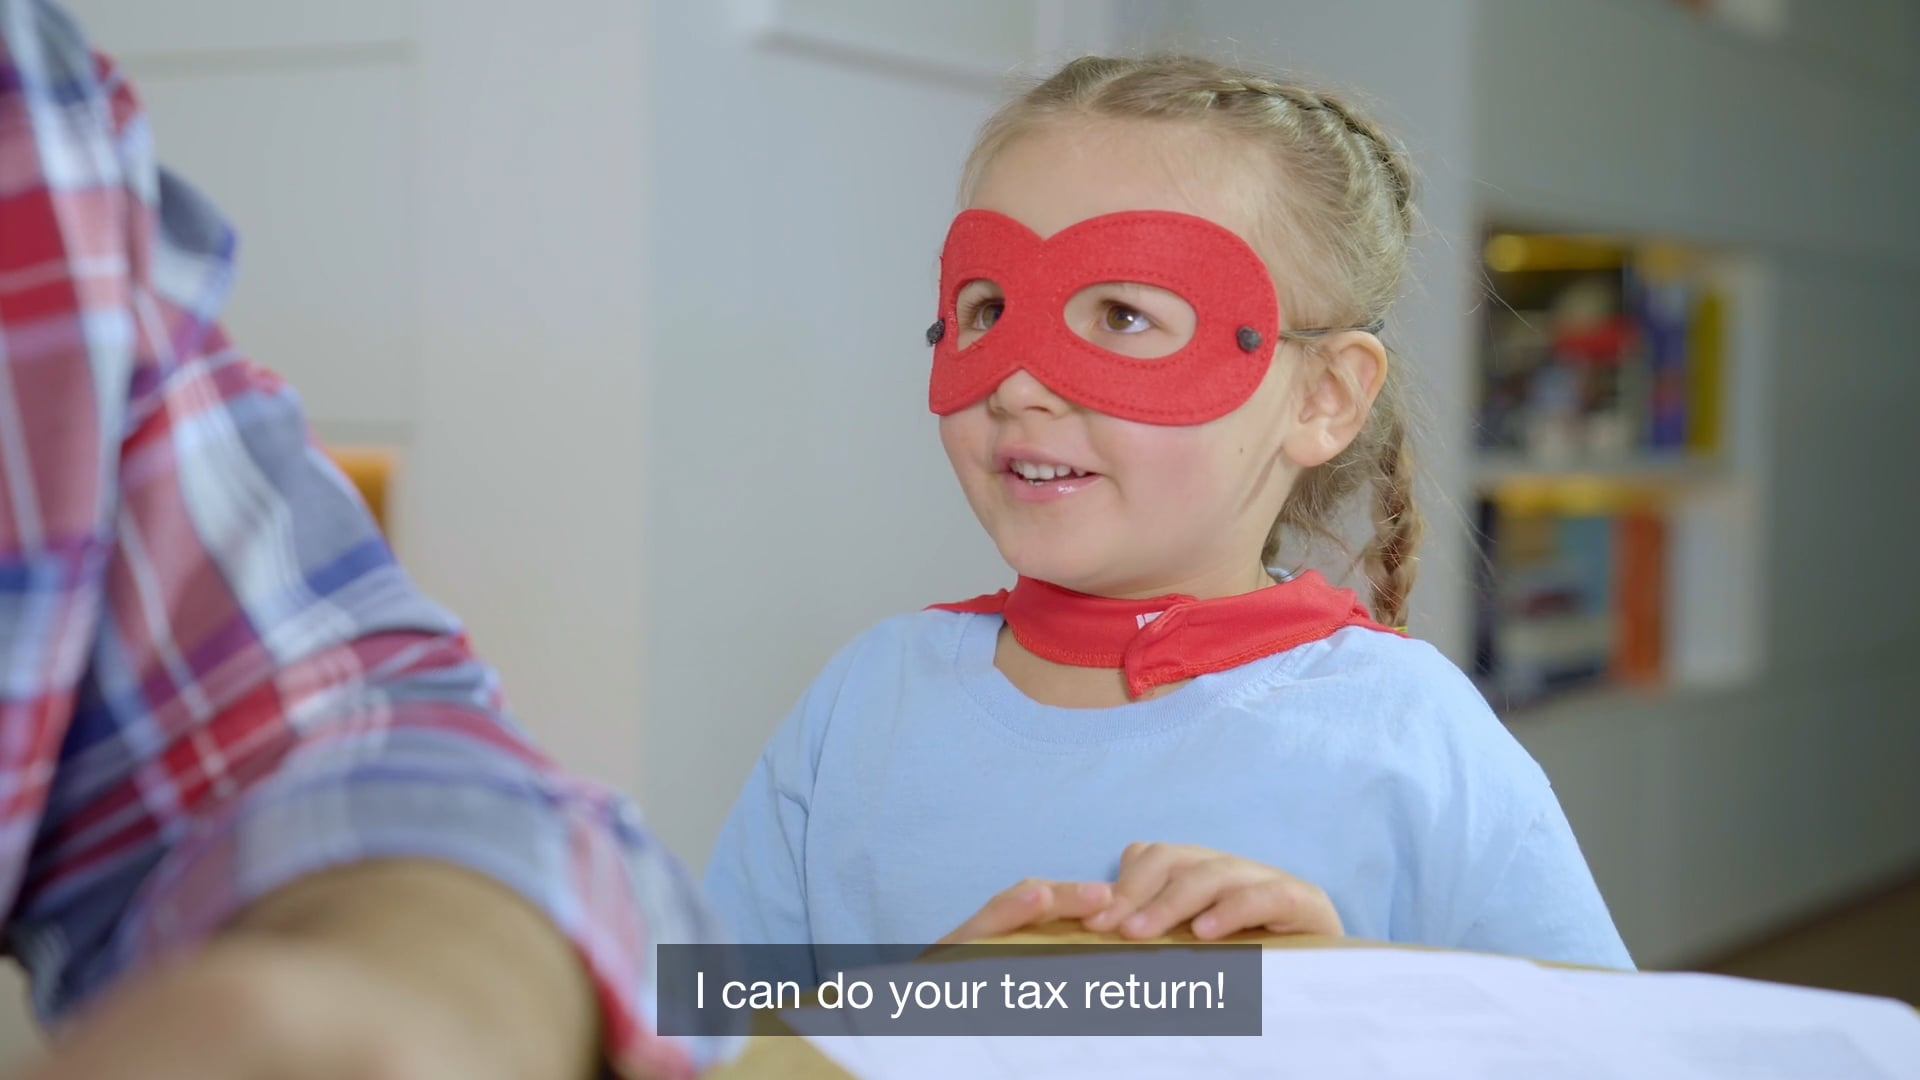 TAXX.LU Cute Commercial